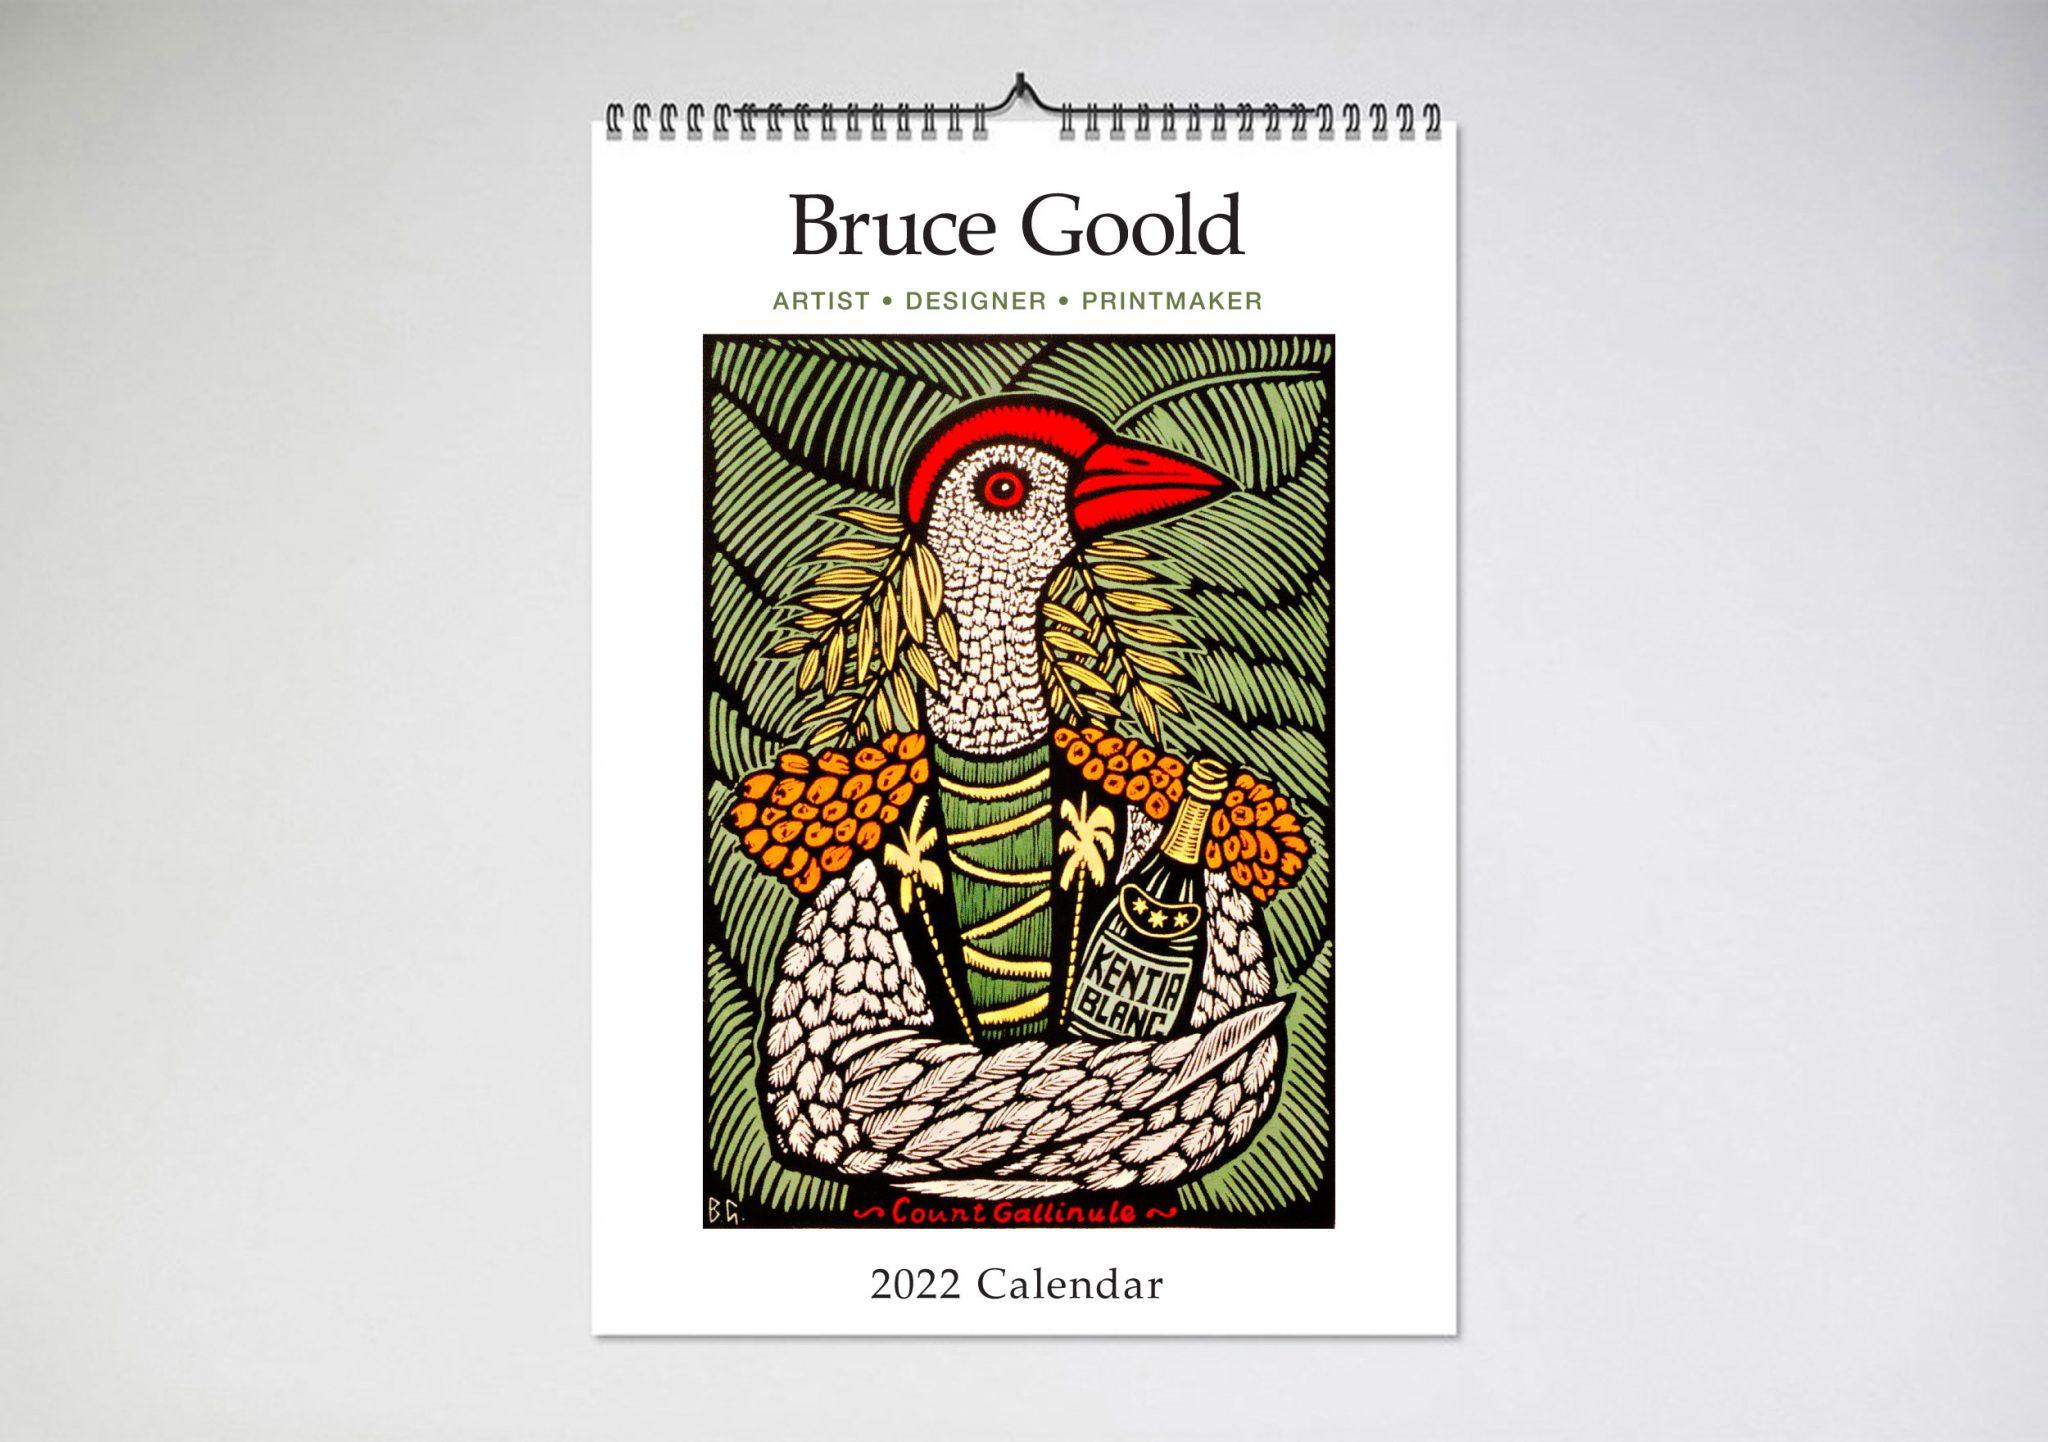 Bruce Goold 2022 Wall Calendar - Blue Island Press for Retail Calendar 2022 4-5-4 Explained